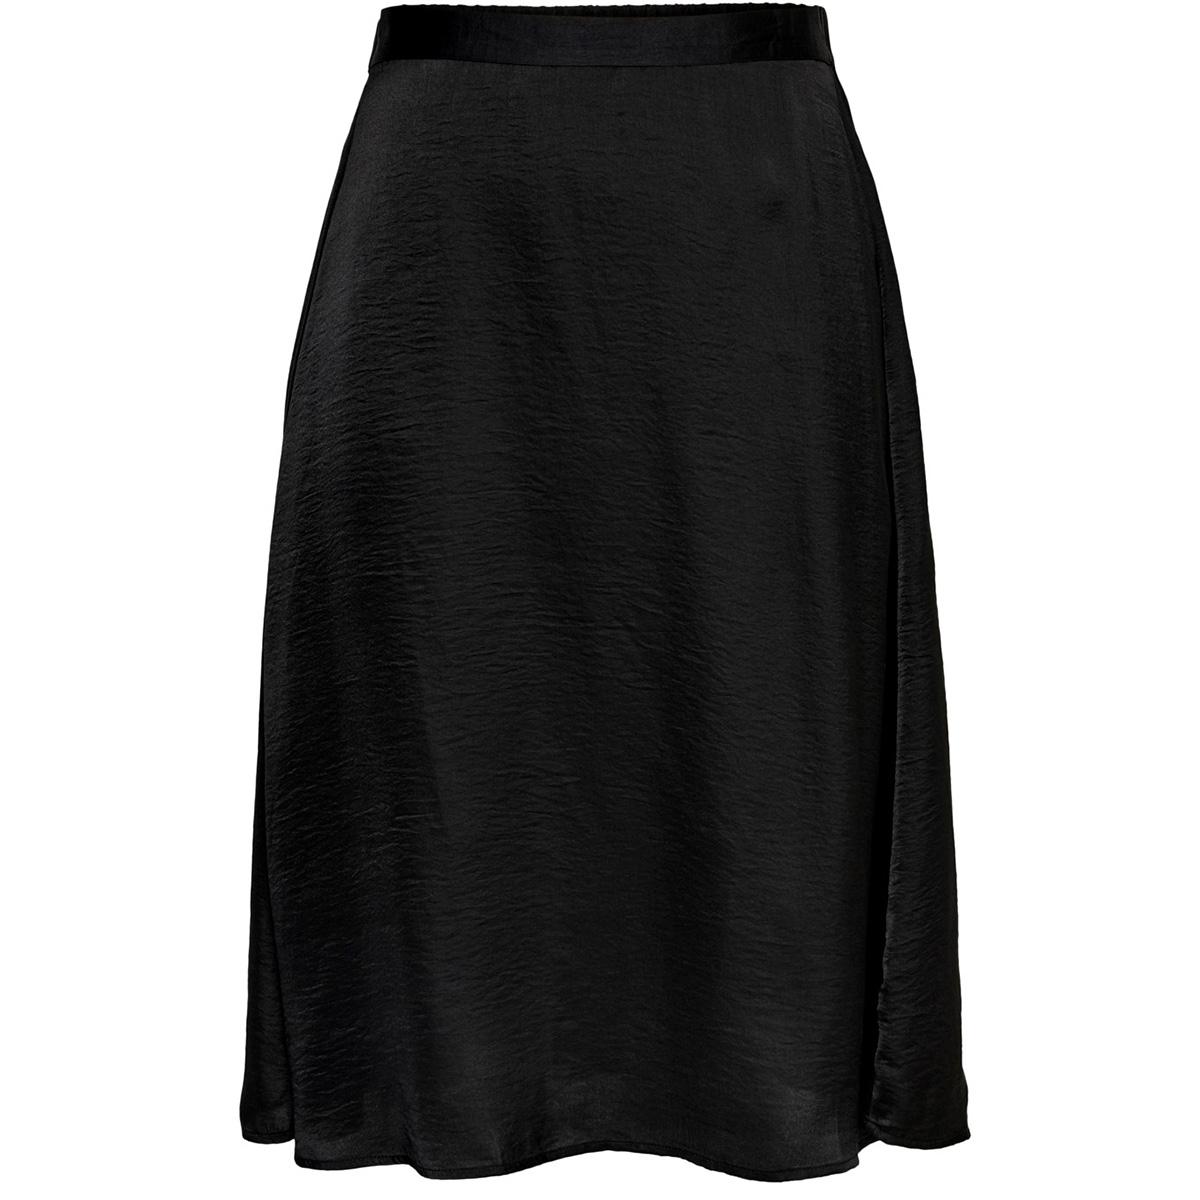 jdysean skirt wvn exp 15195364 jacqueline de yong rok black